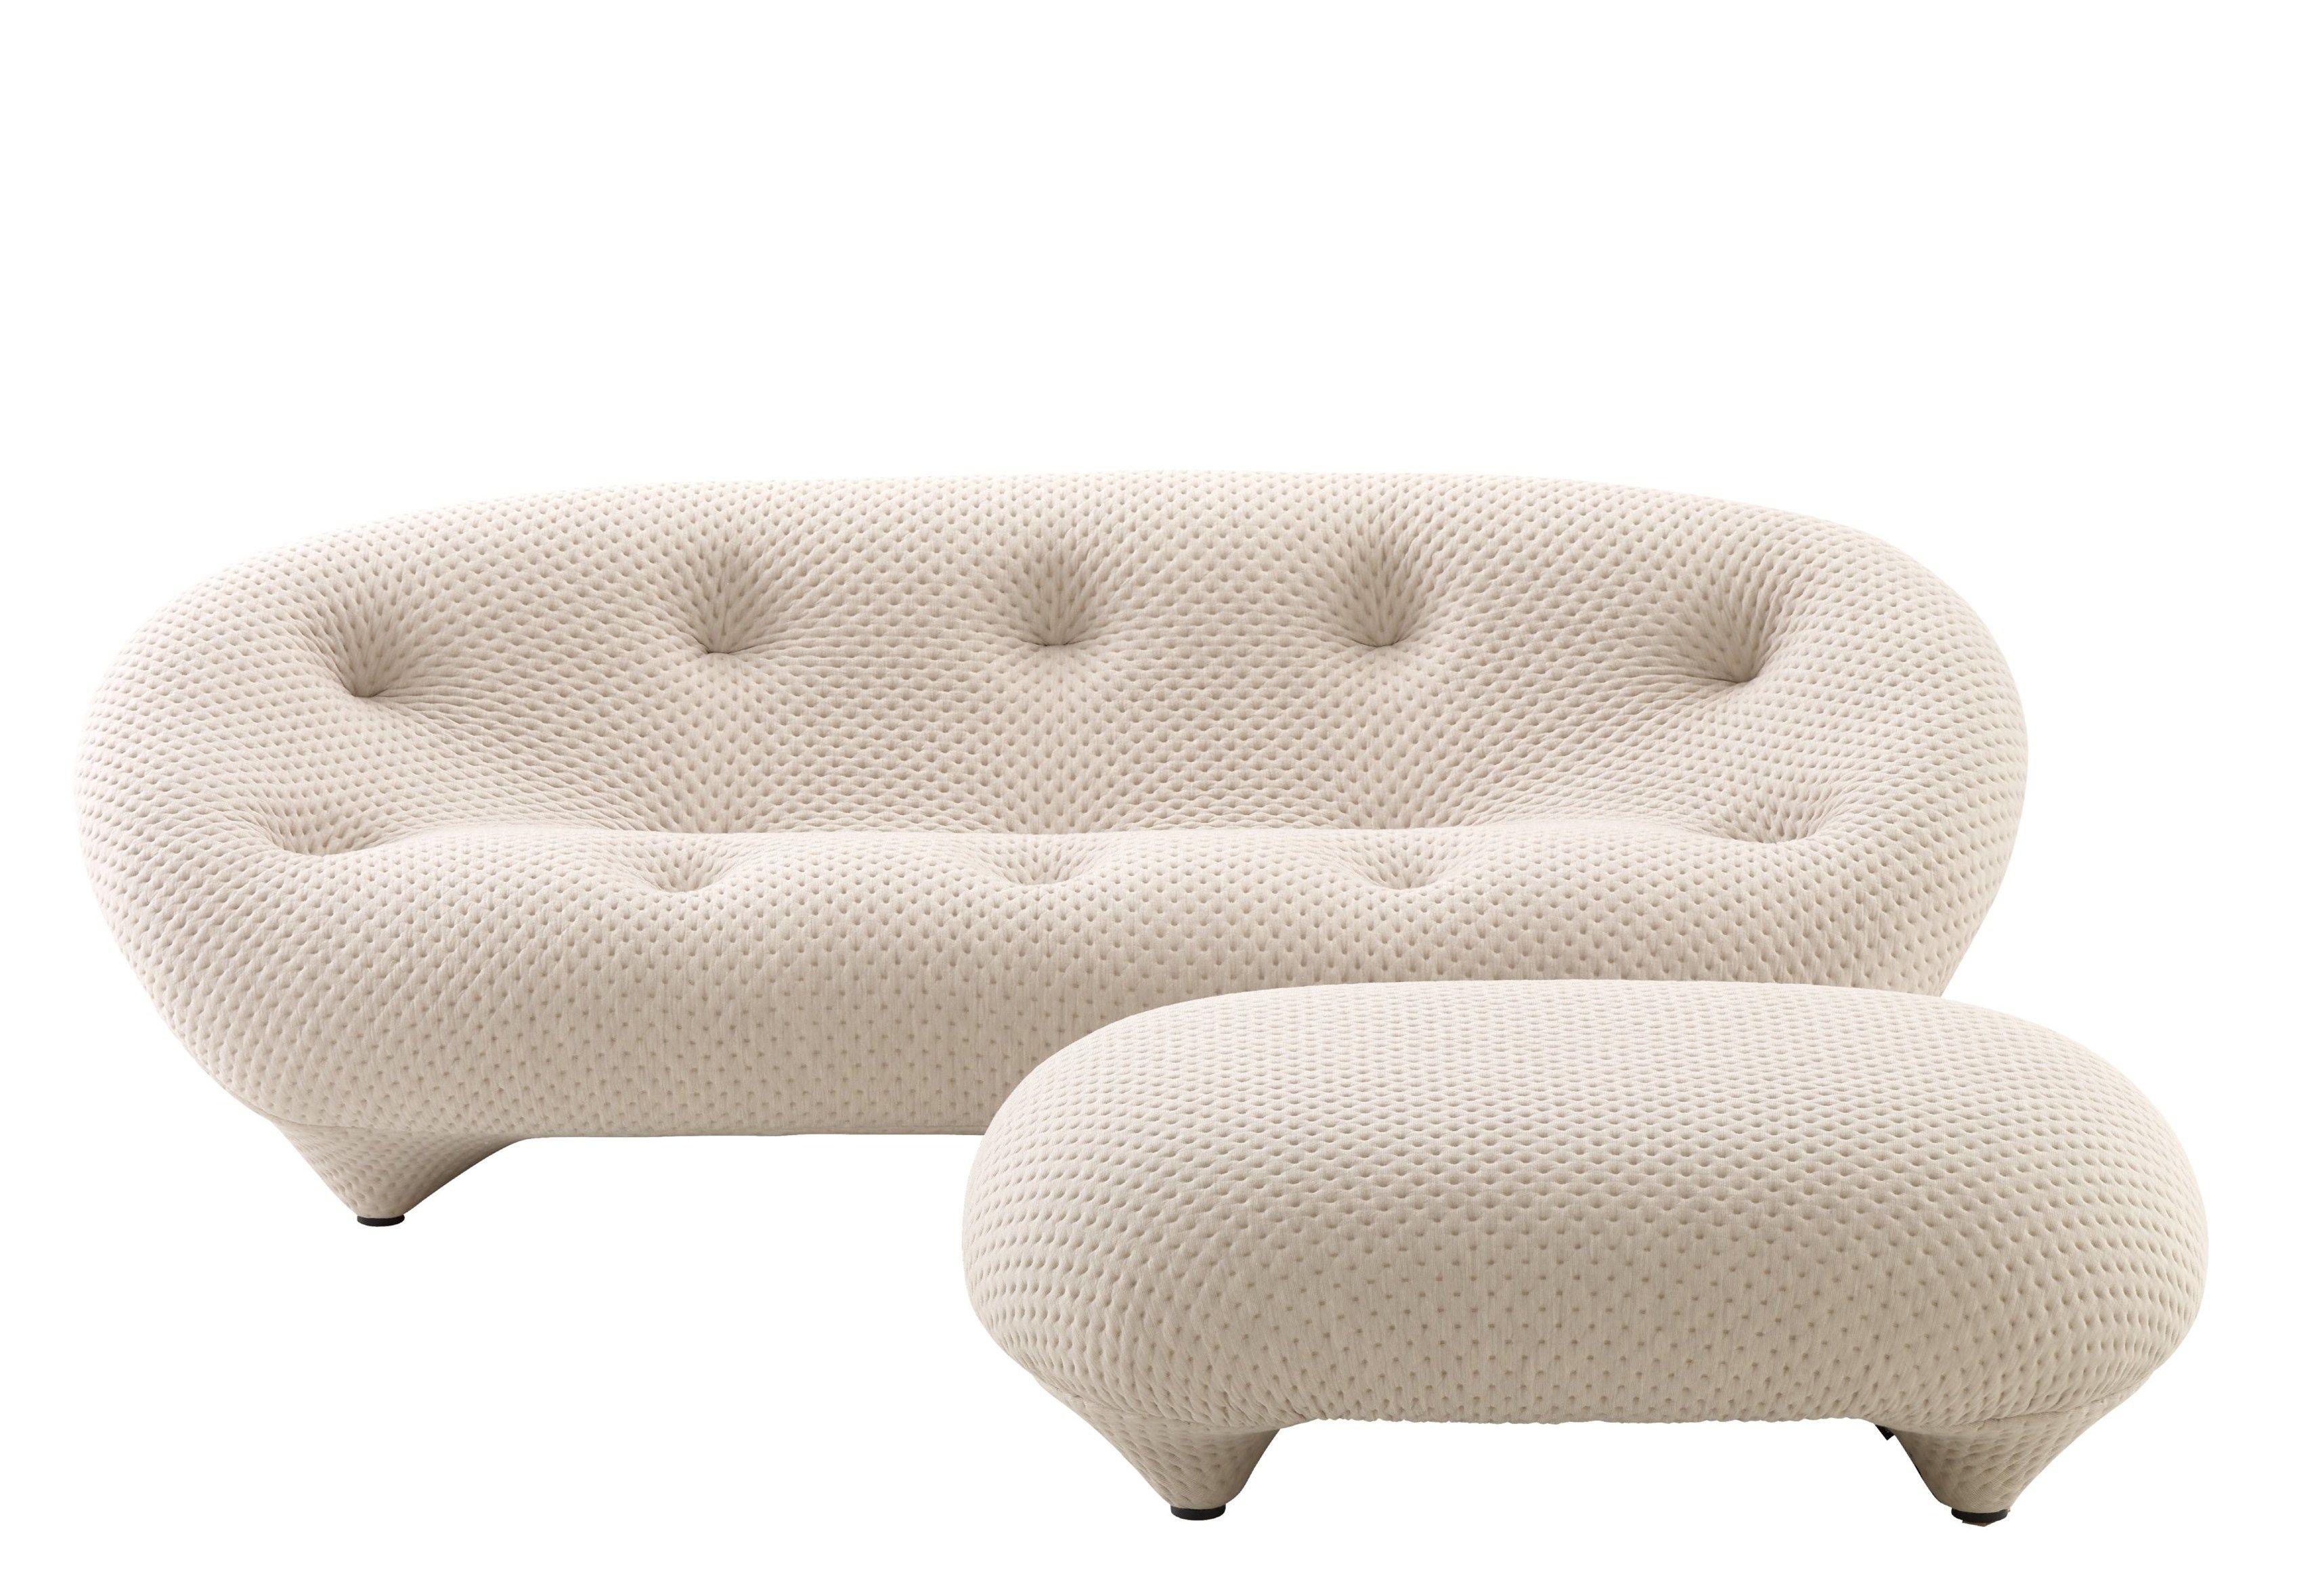 Hocker Fr Sofa. Top Full Size Of Hockerbank Hocker Cyberbaseco ...